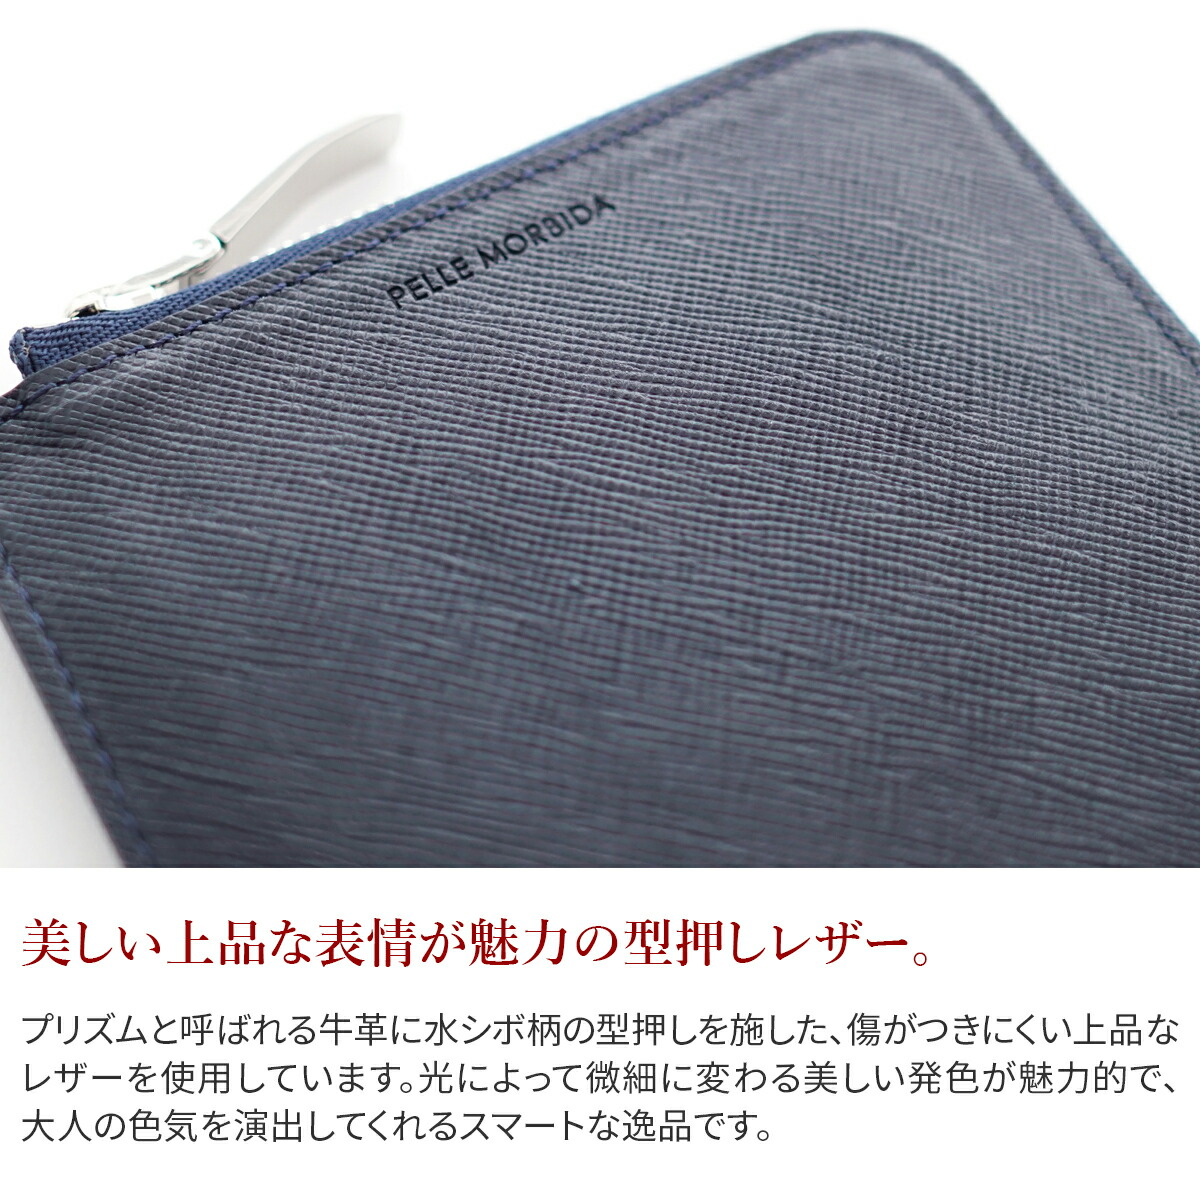 175fb718a3d1 選べる実用的ノベルティ付】 PELLE MORBIDA 日本製 PELLE MORBIDA ...